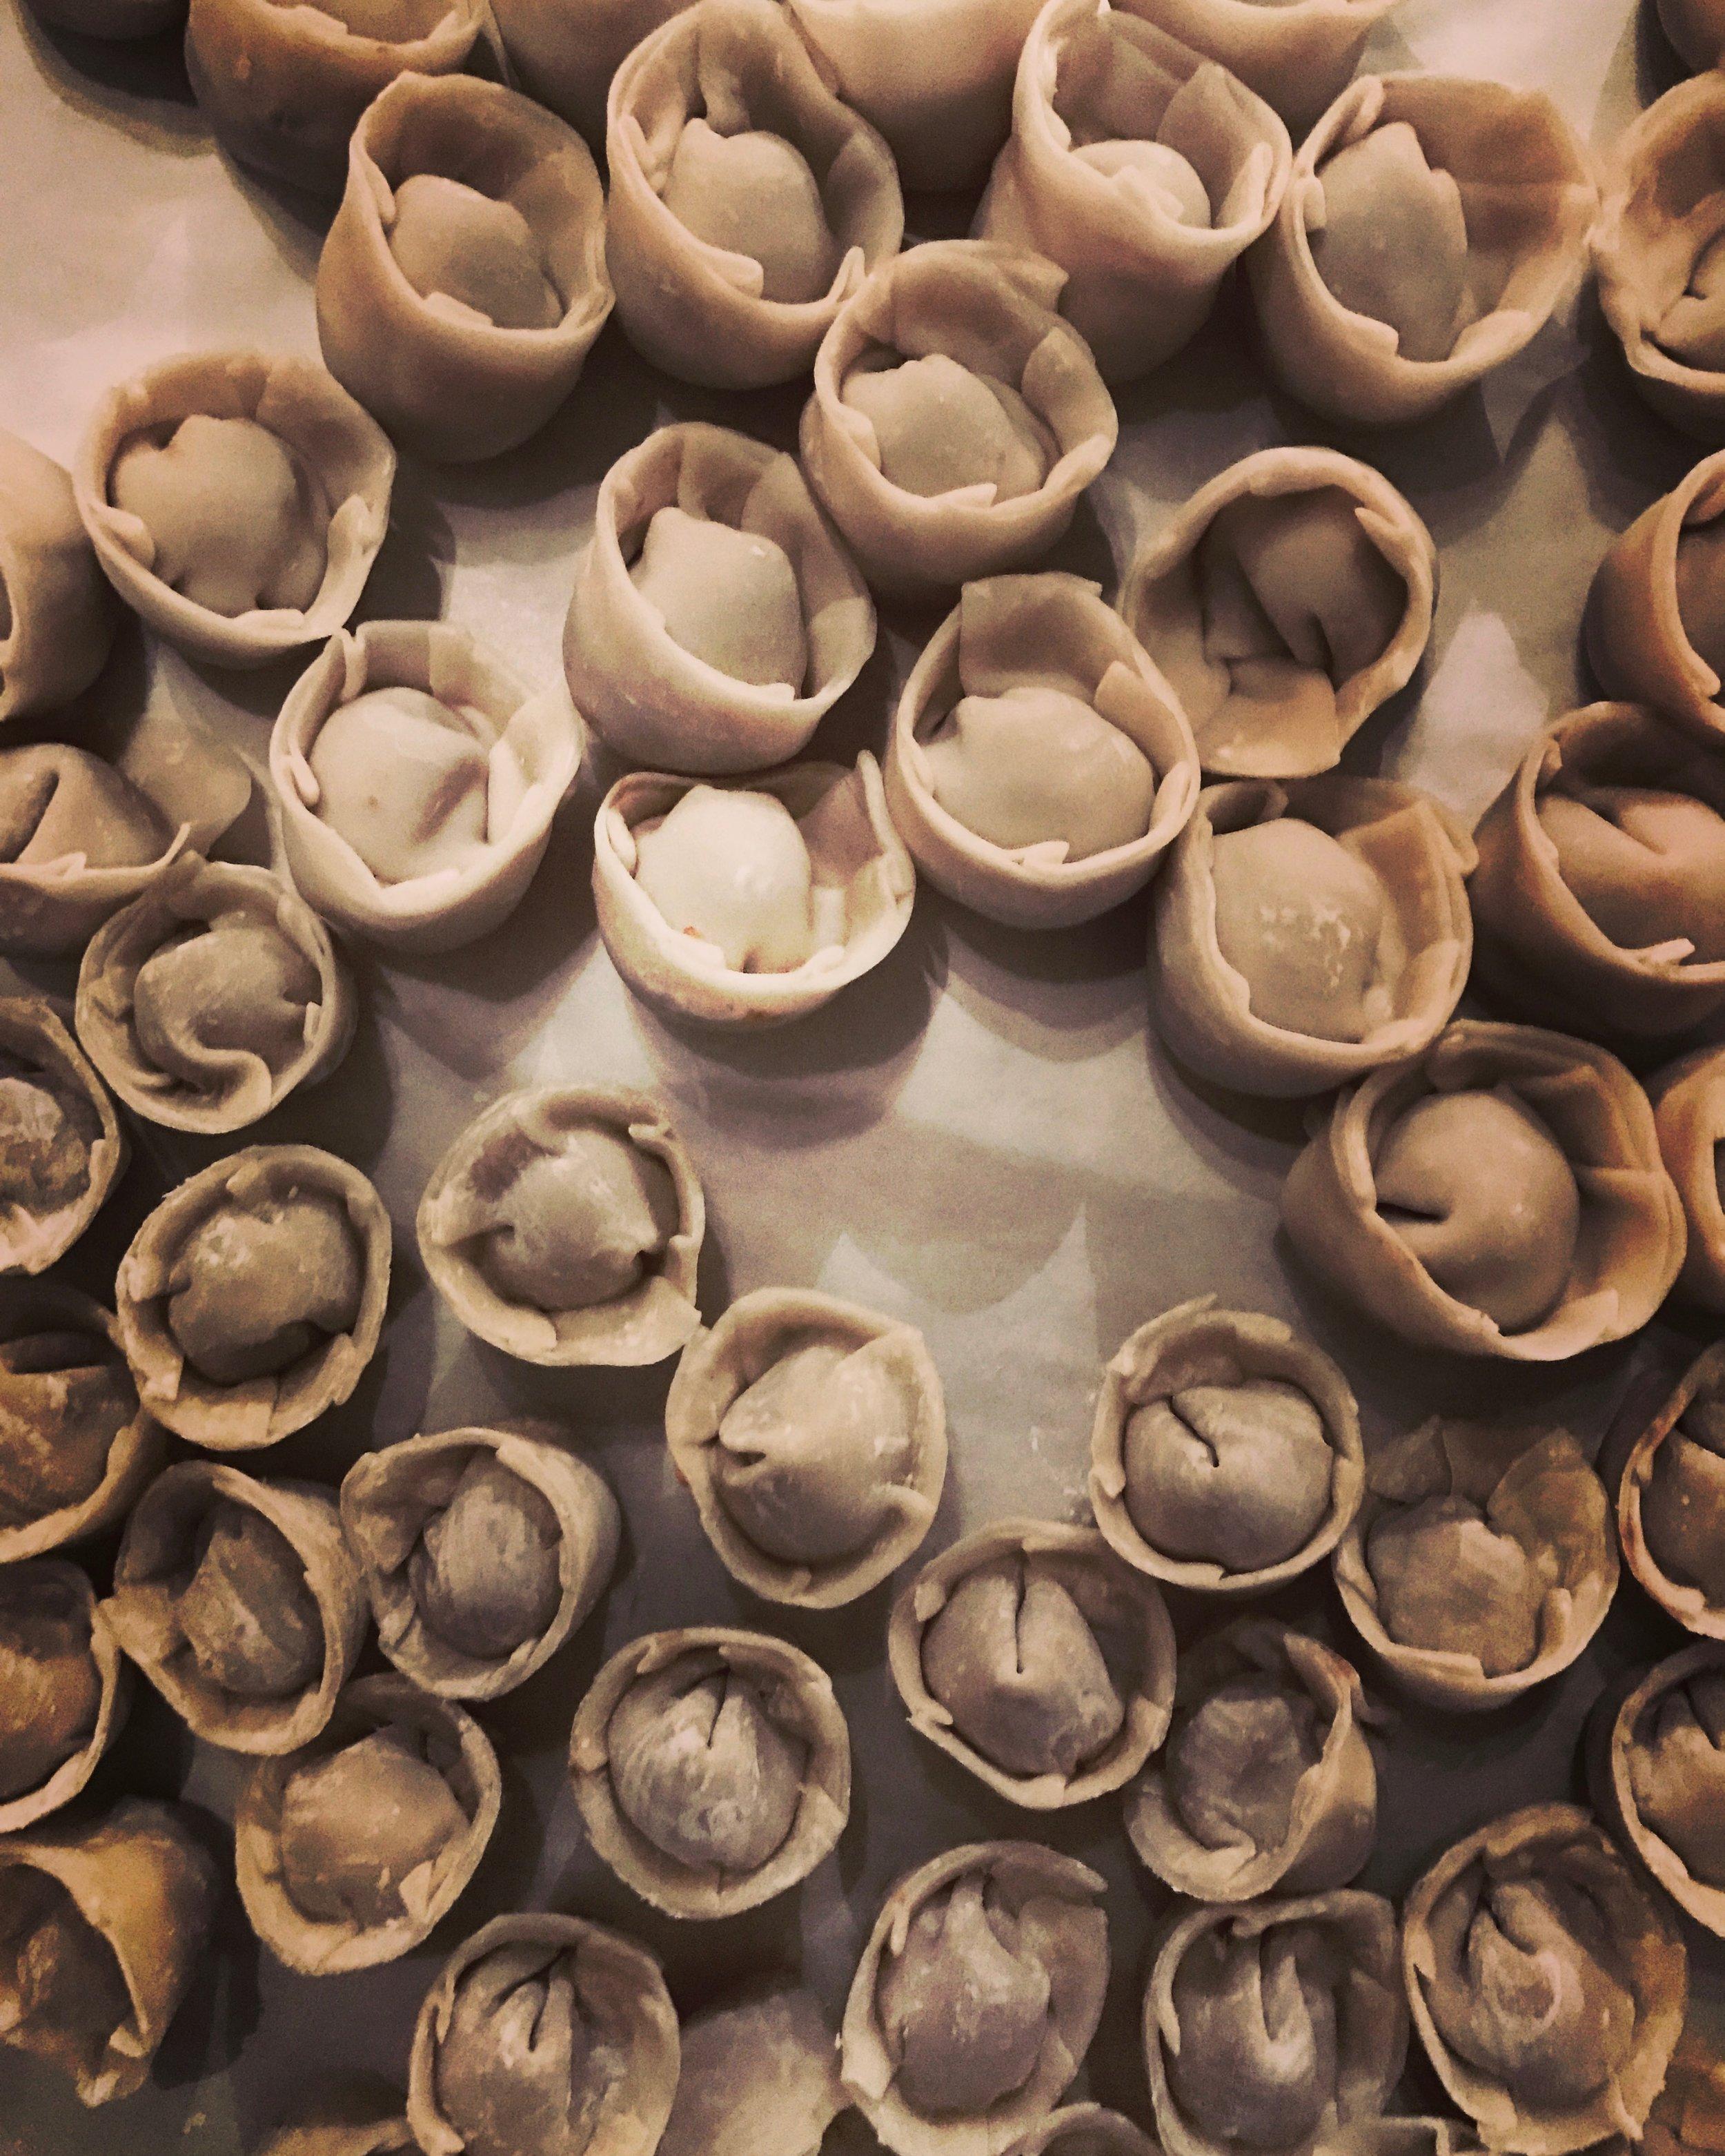 More Hand Made Dumplings